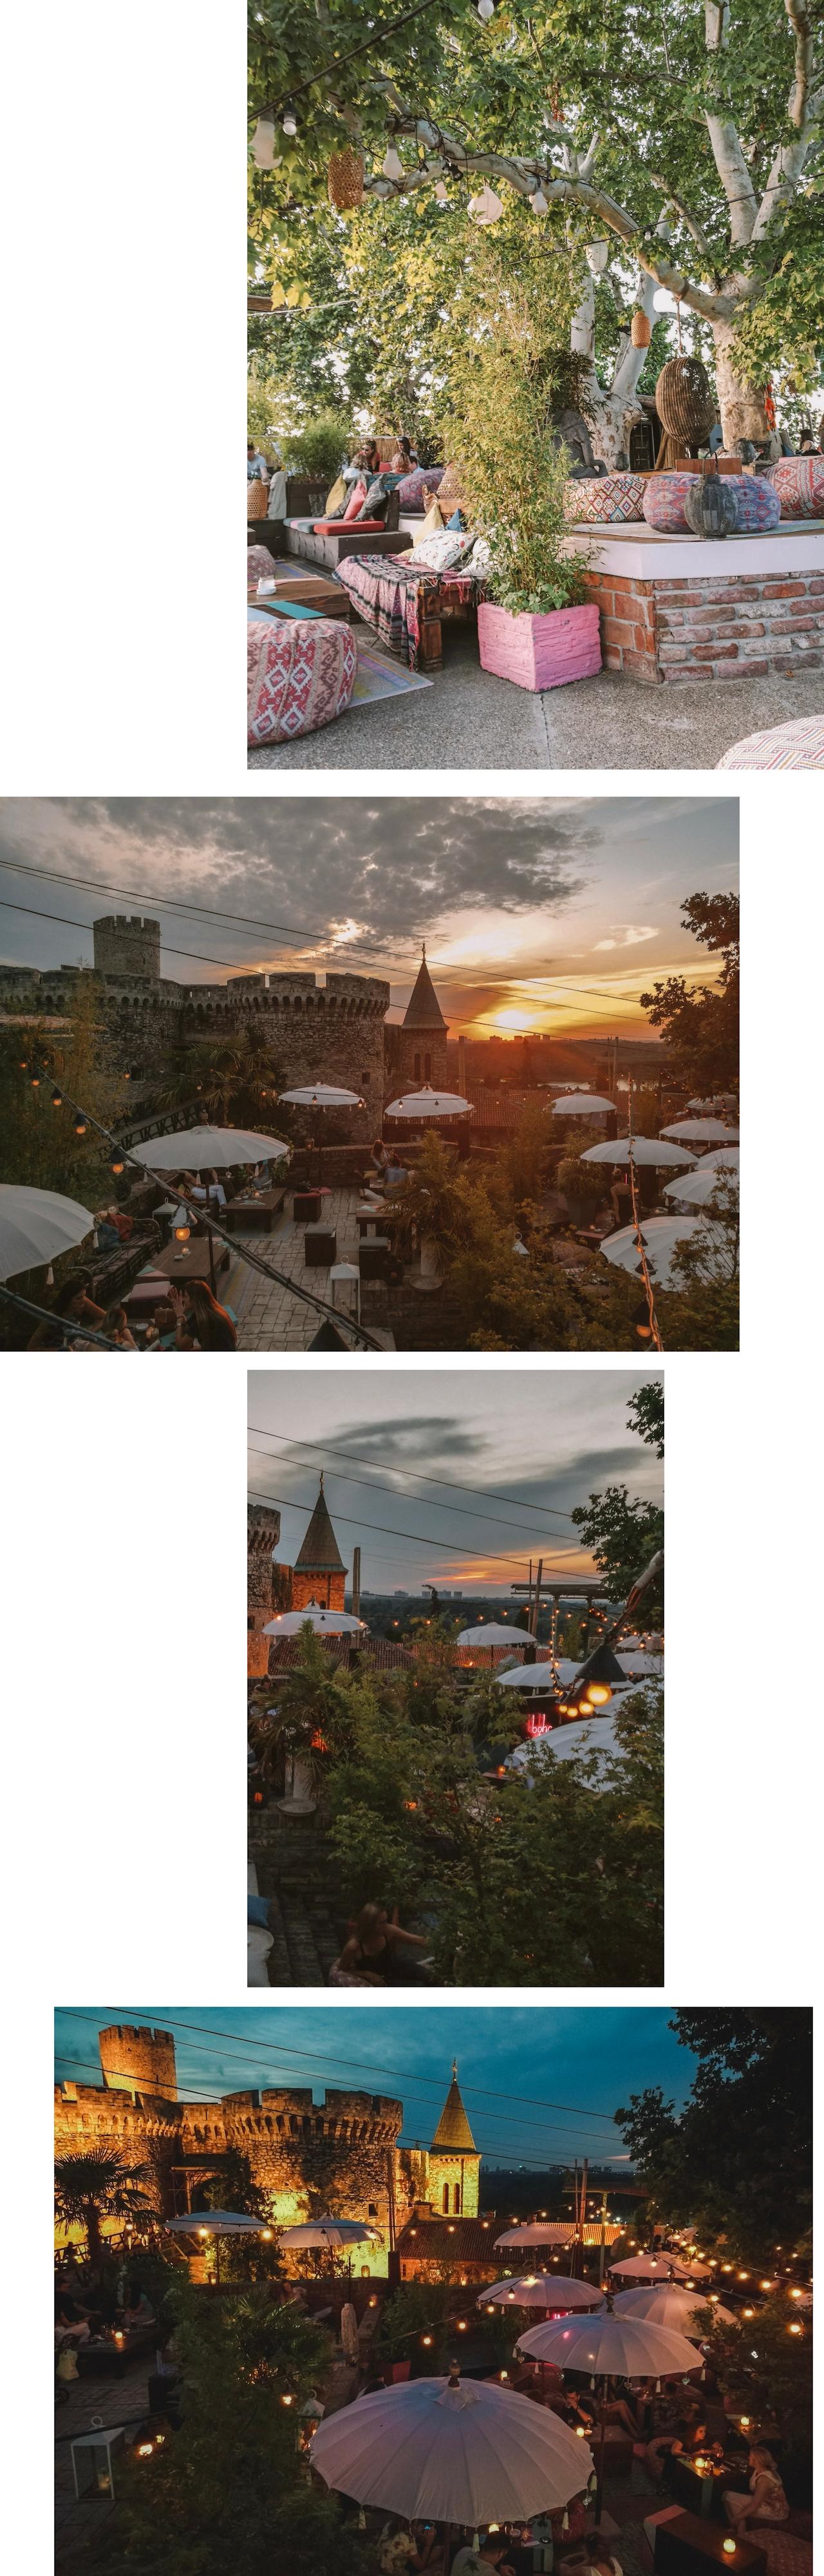 Wochenendtrip-Belgrad-Sonnenuntergang